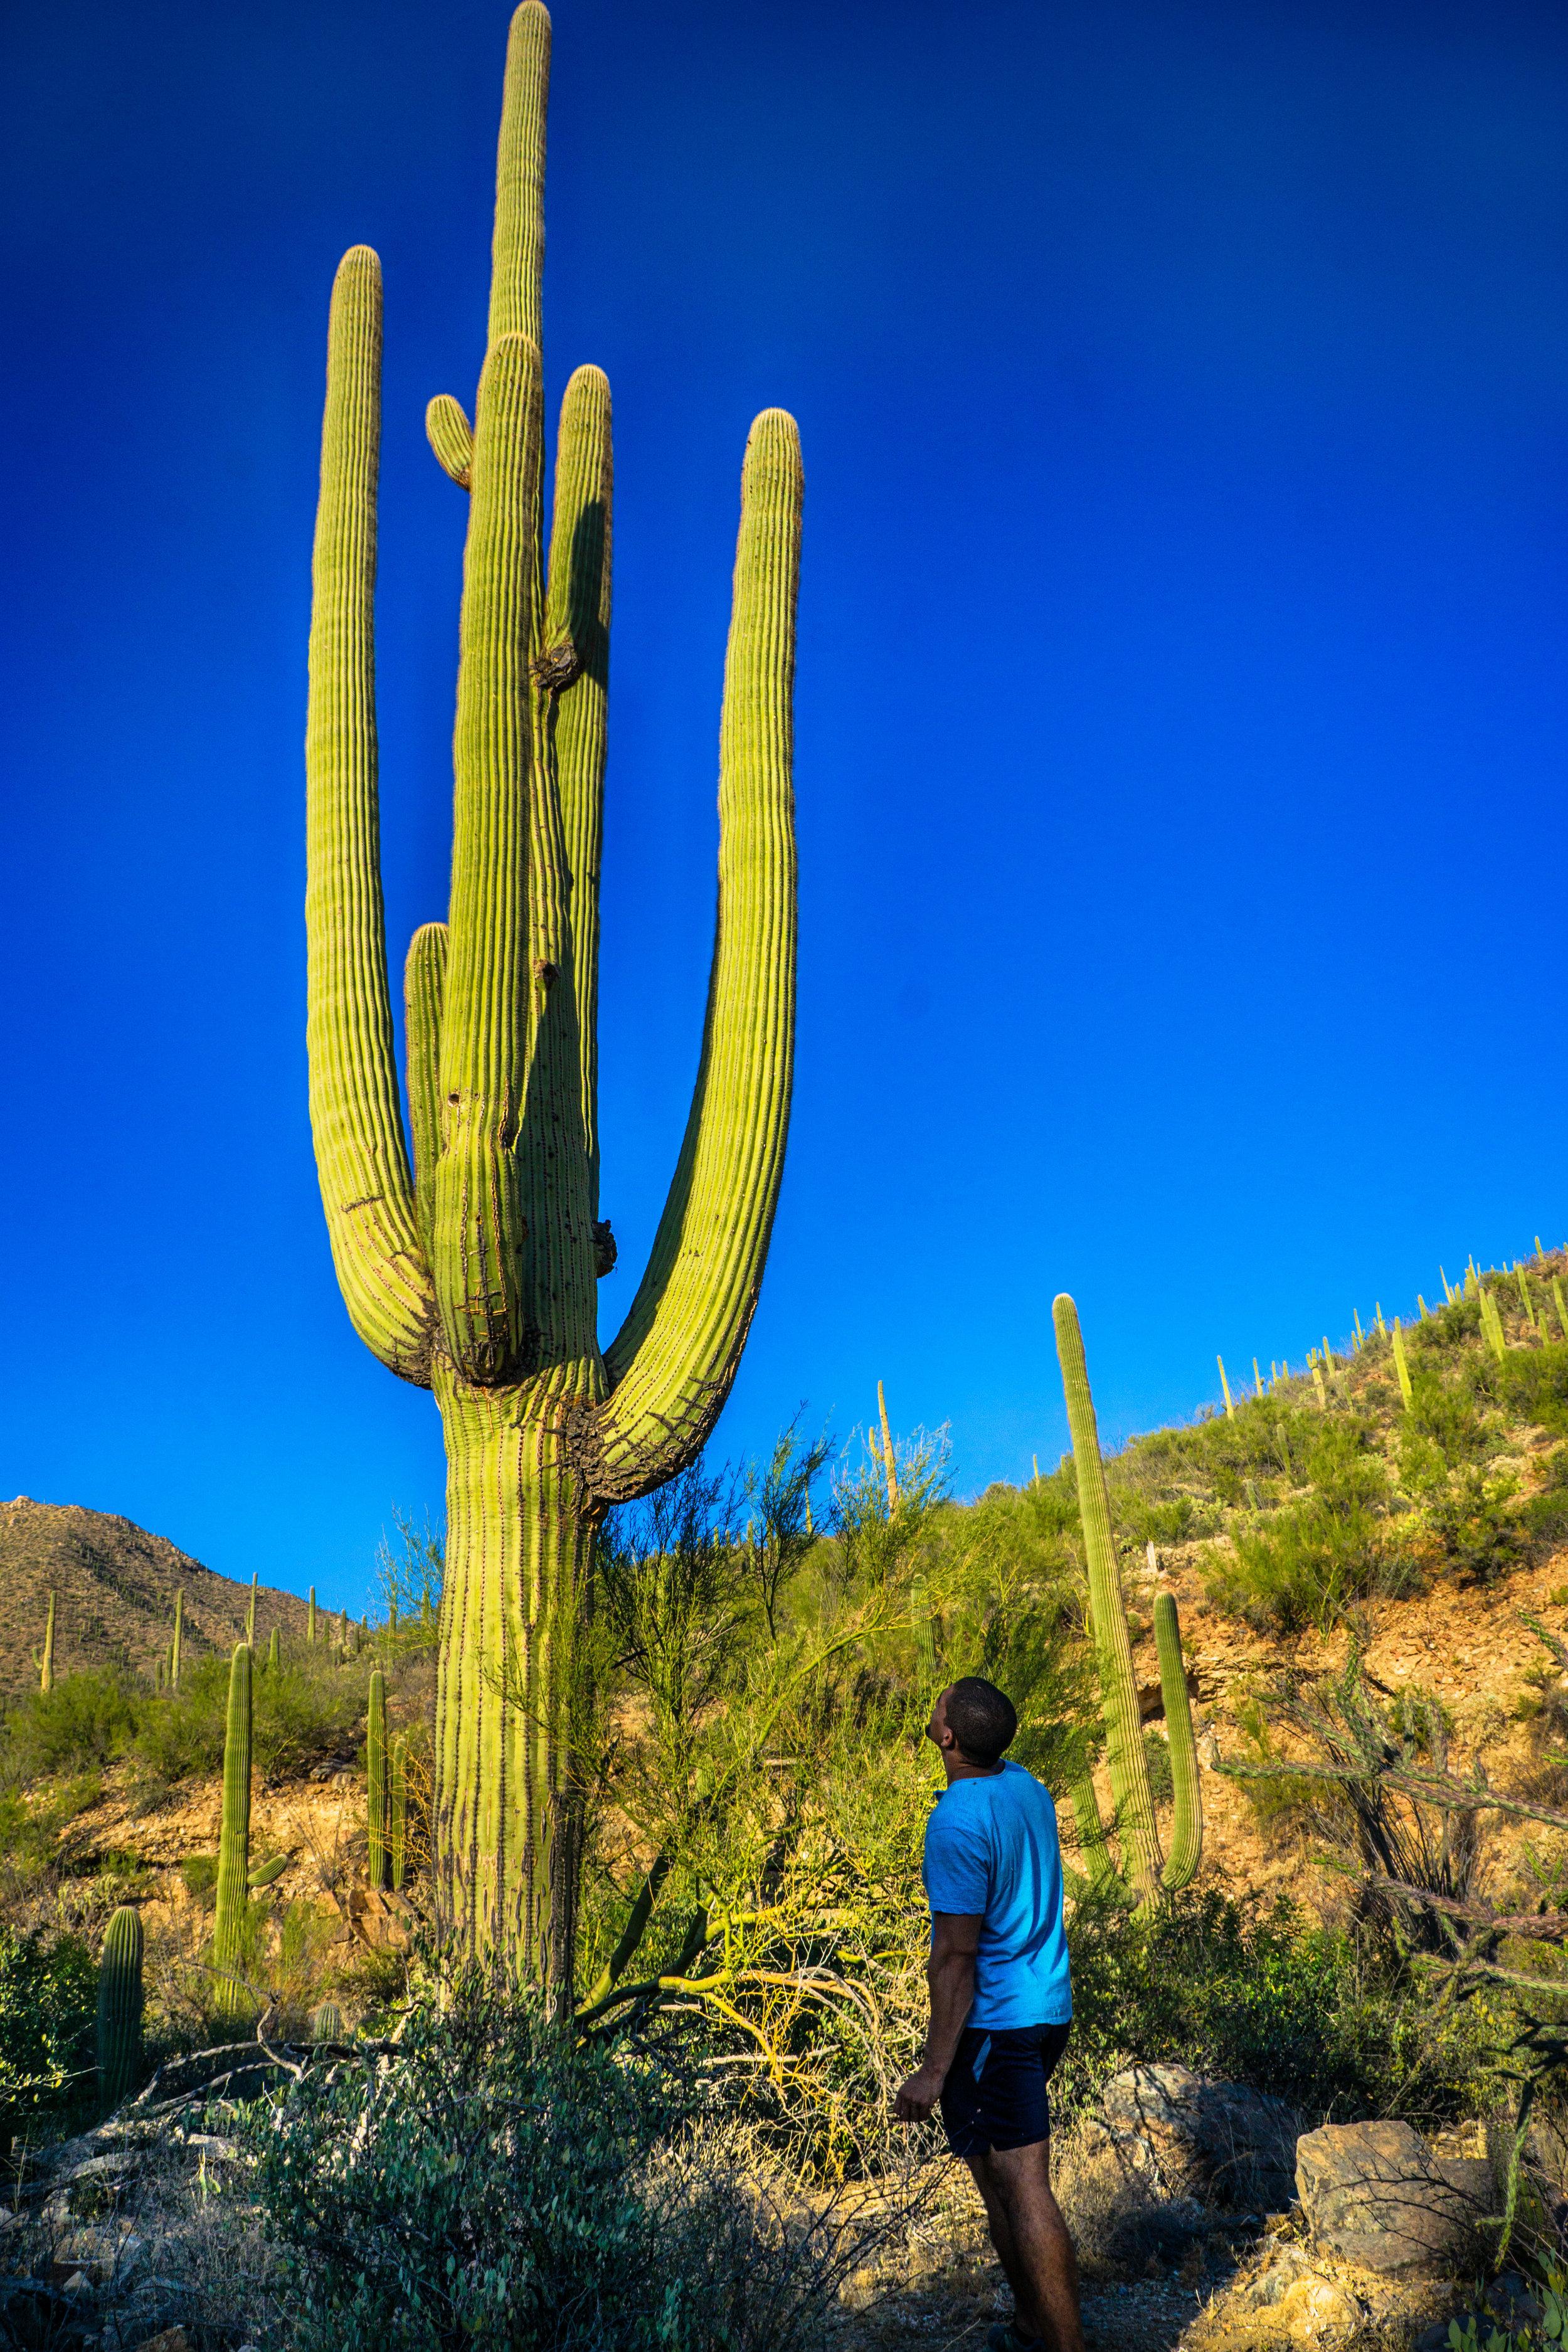 vickygood_photography_nature_saguaro-park8.jpg